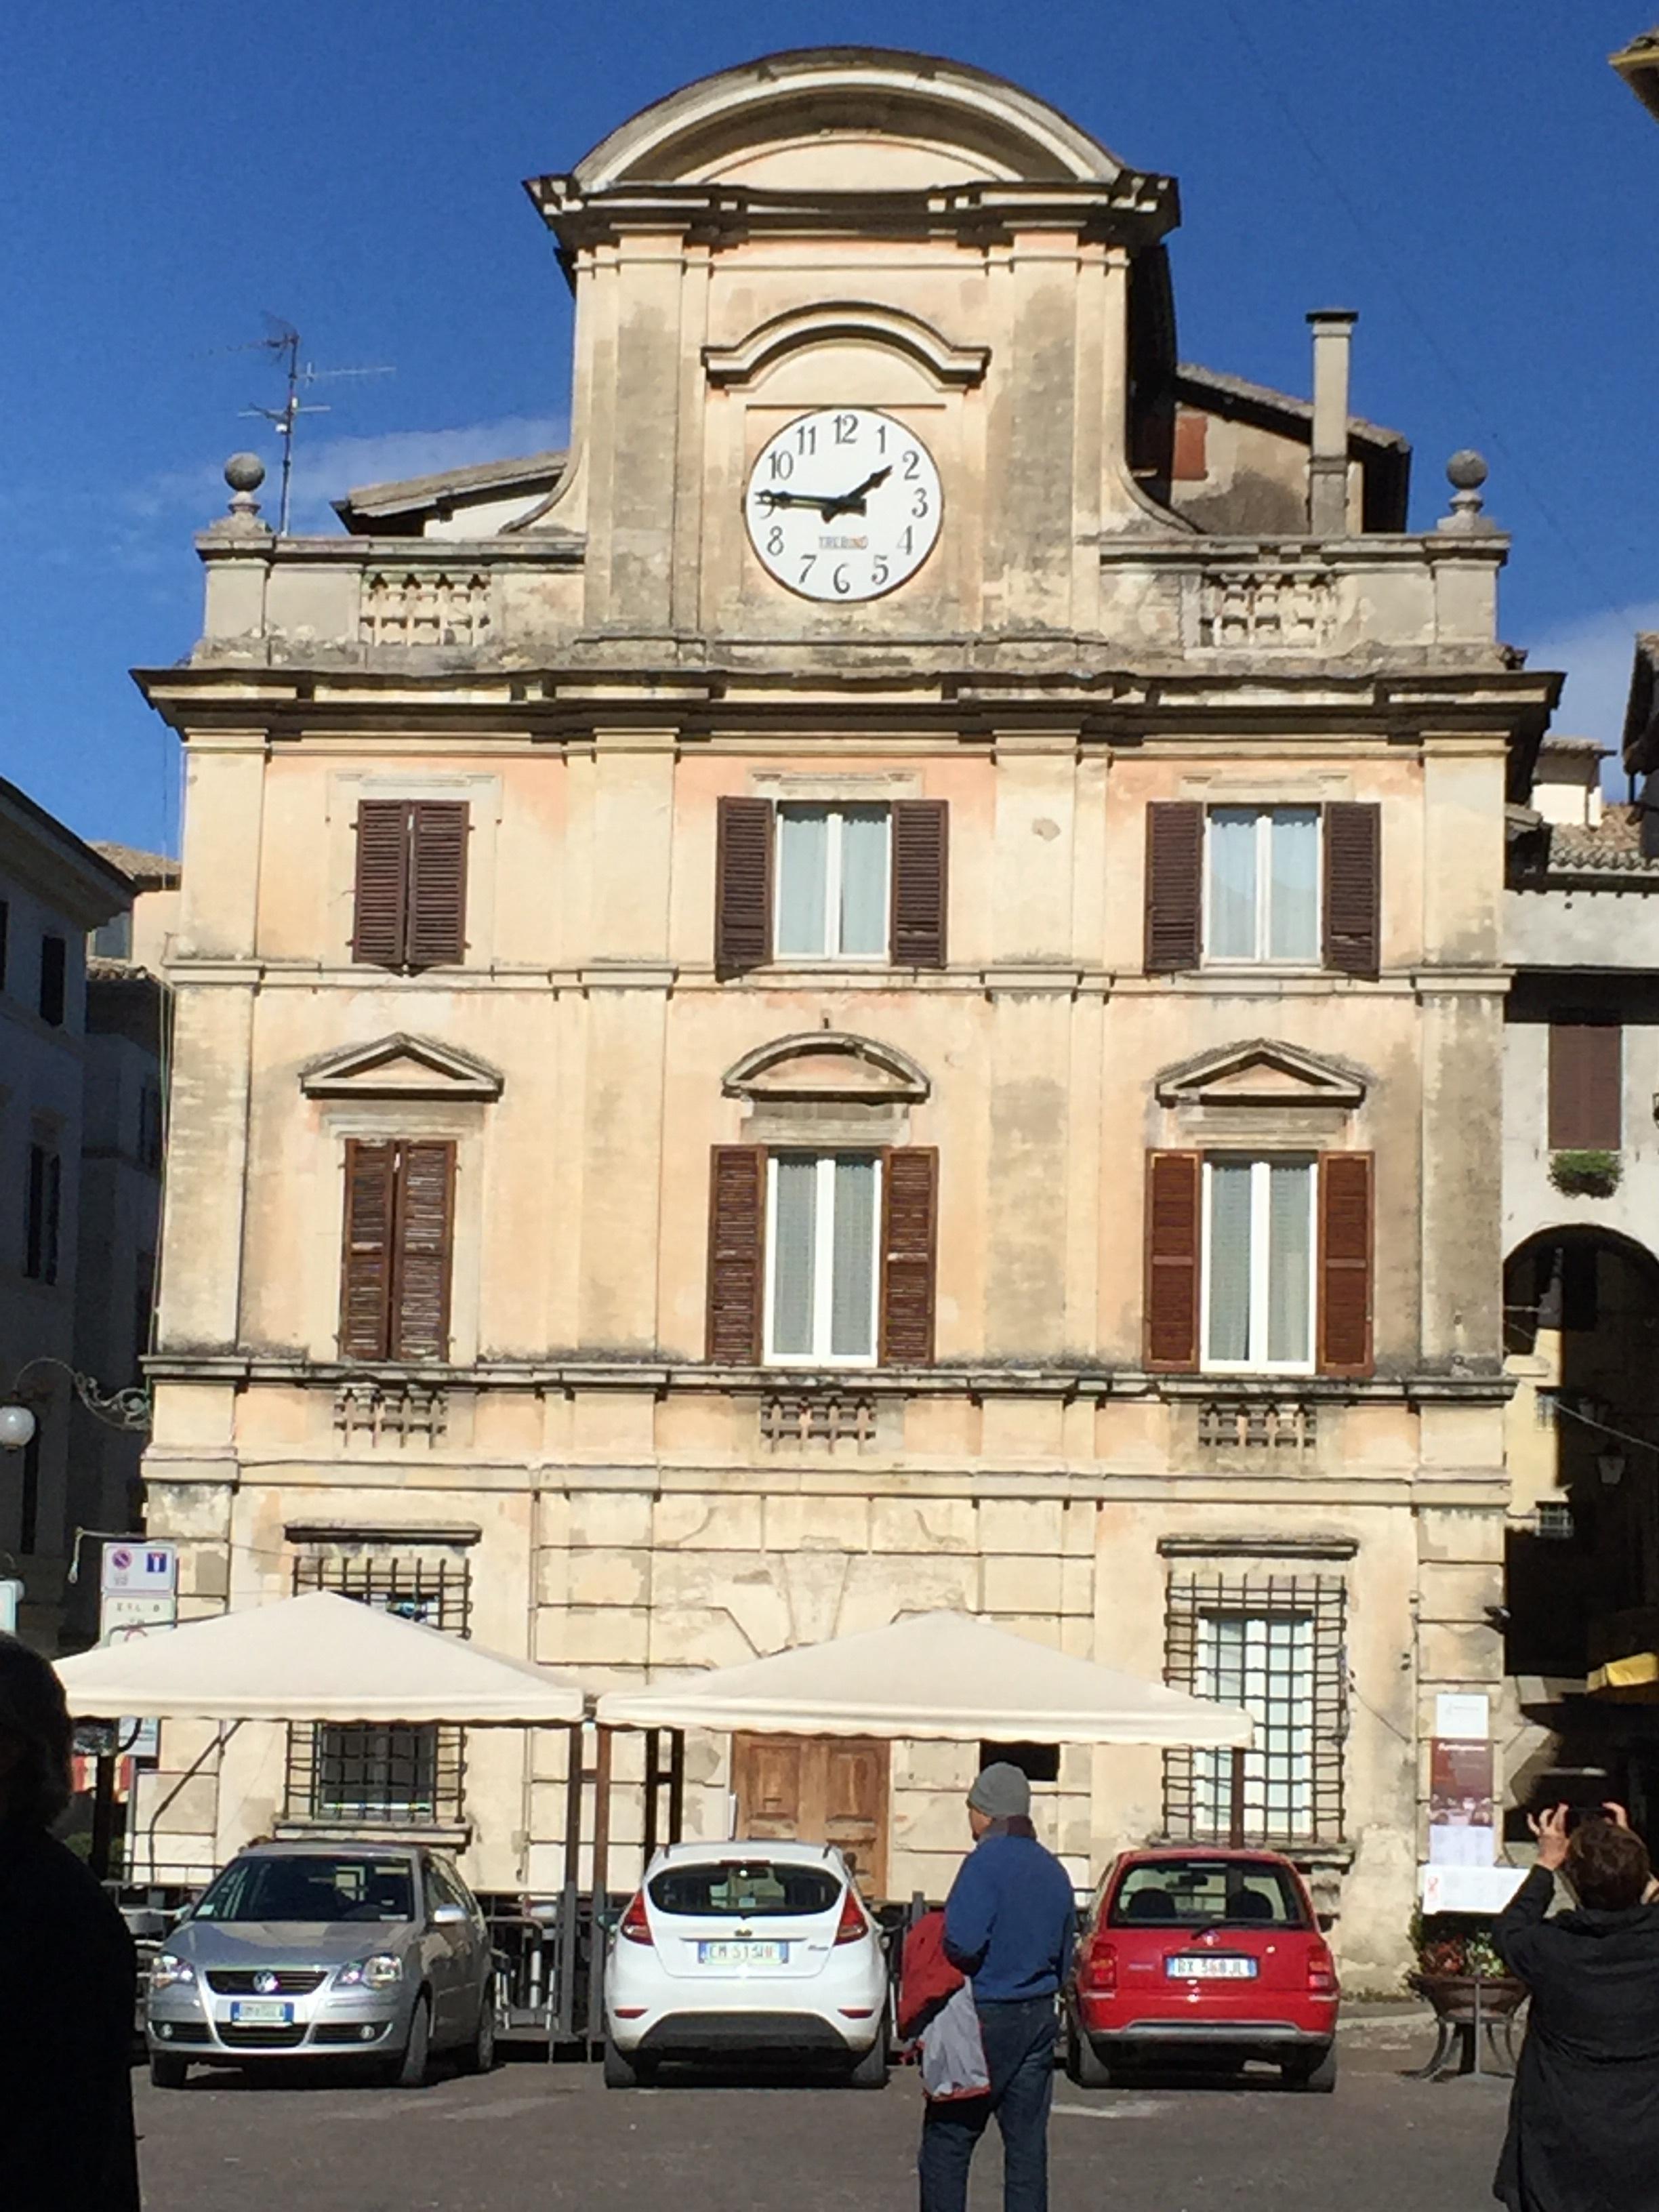 Spoleto building with clocktower